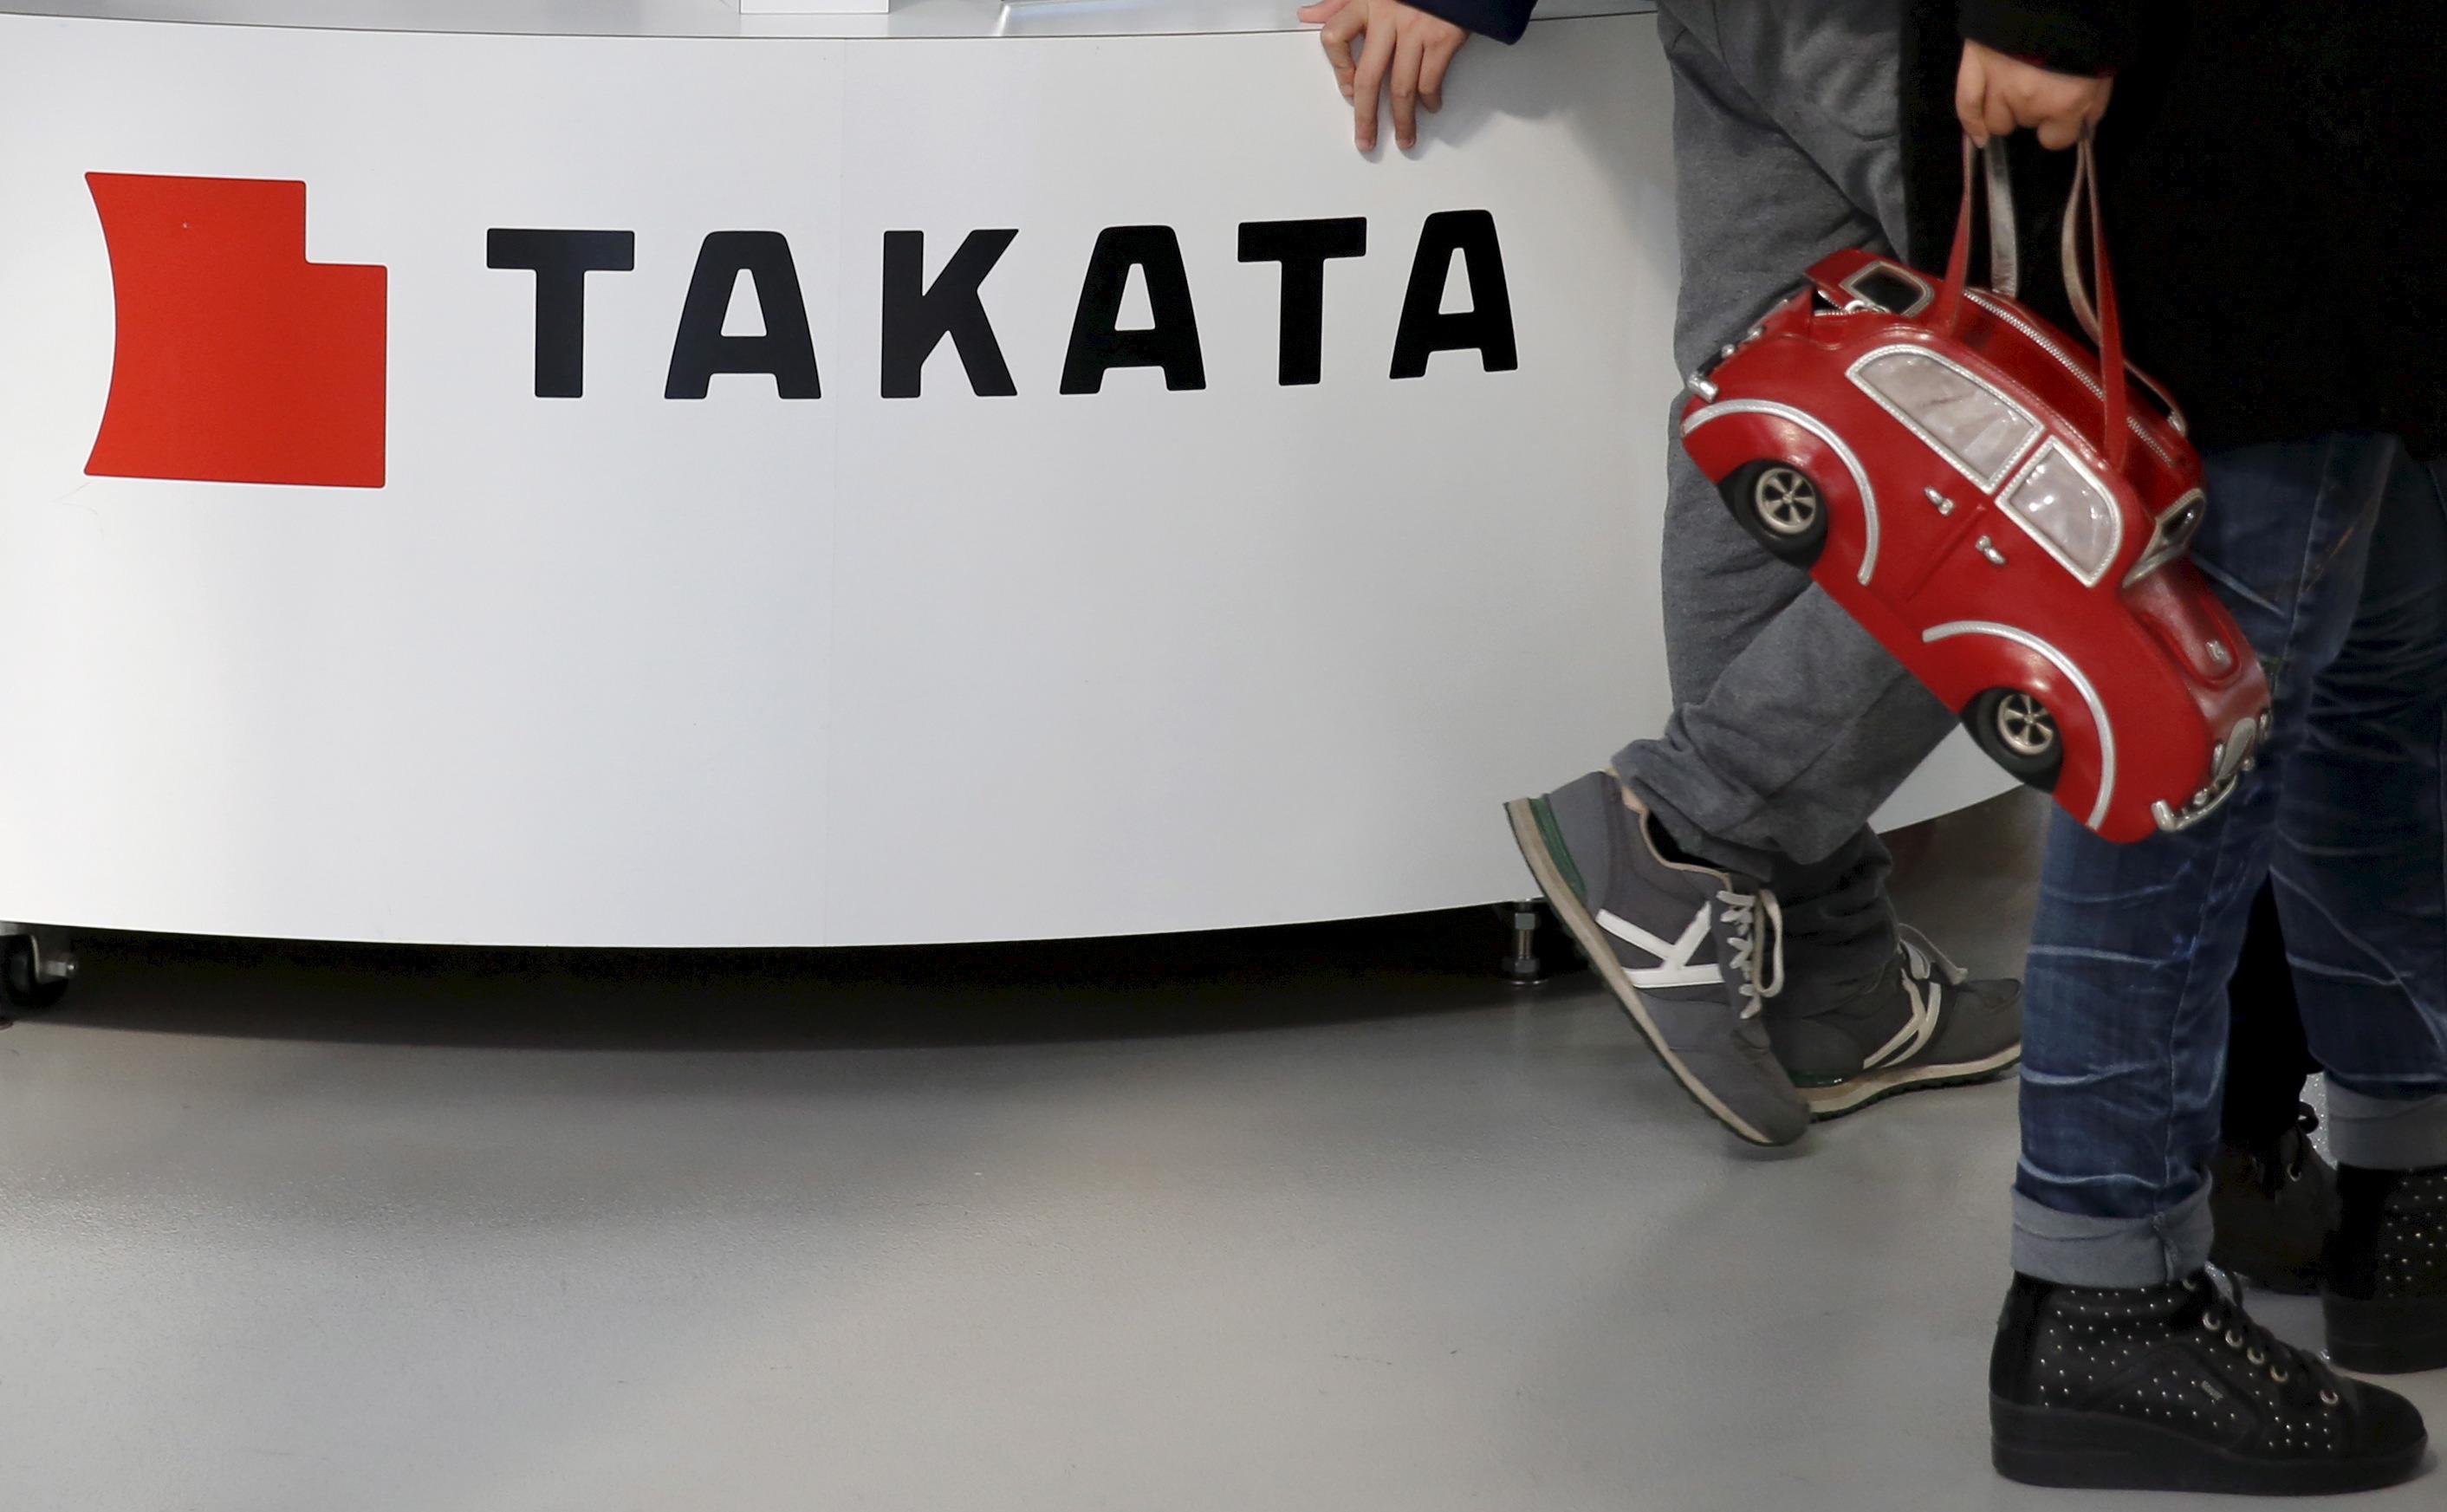 REUTERS/Toru Hanai/Files